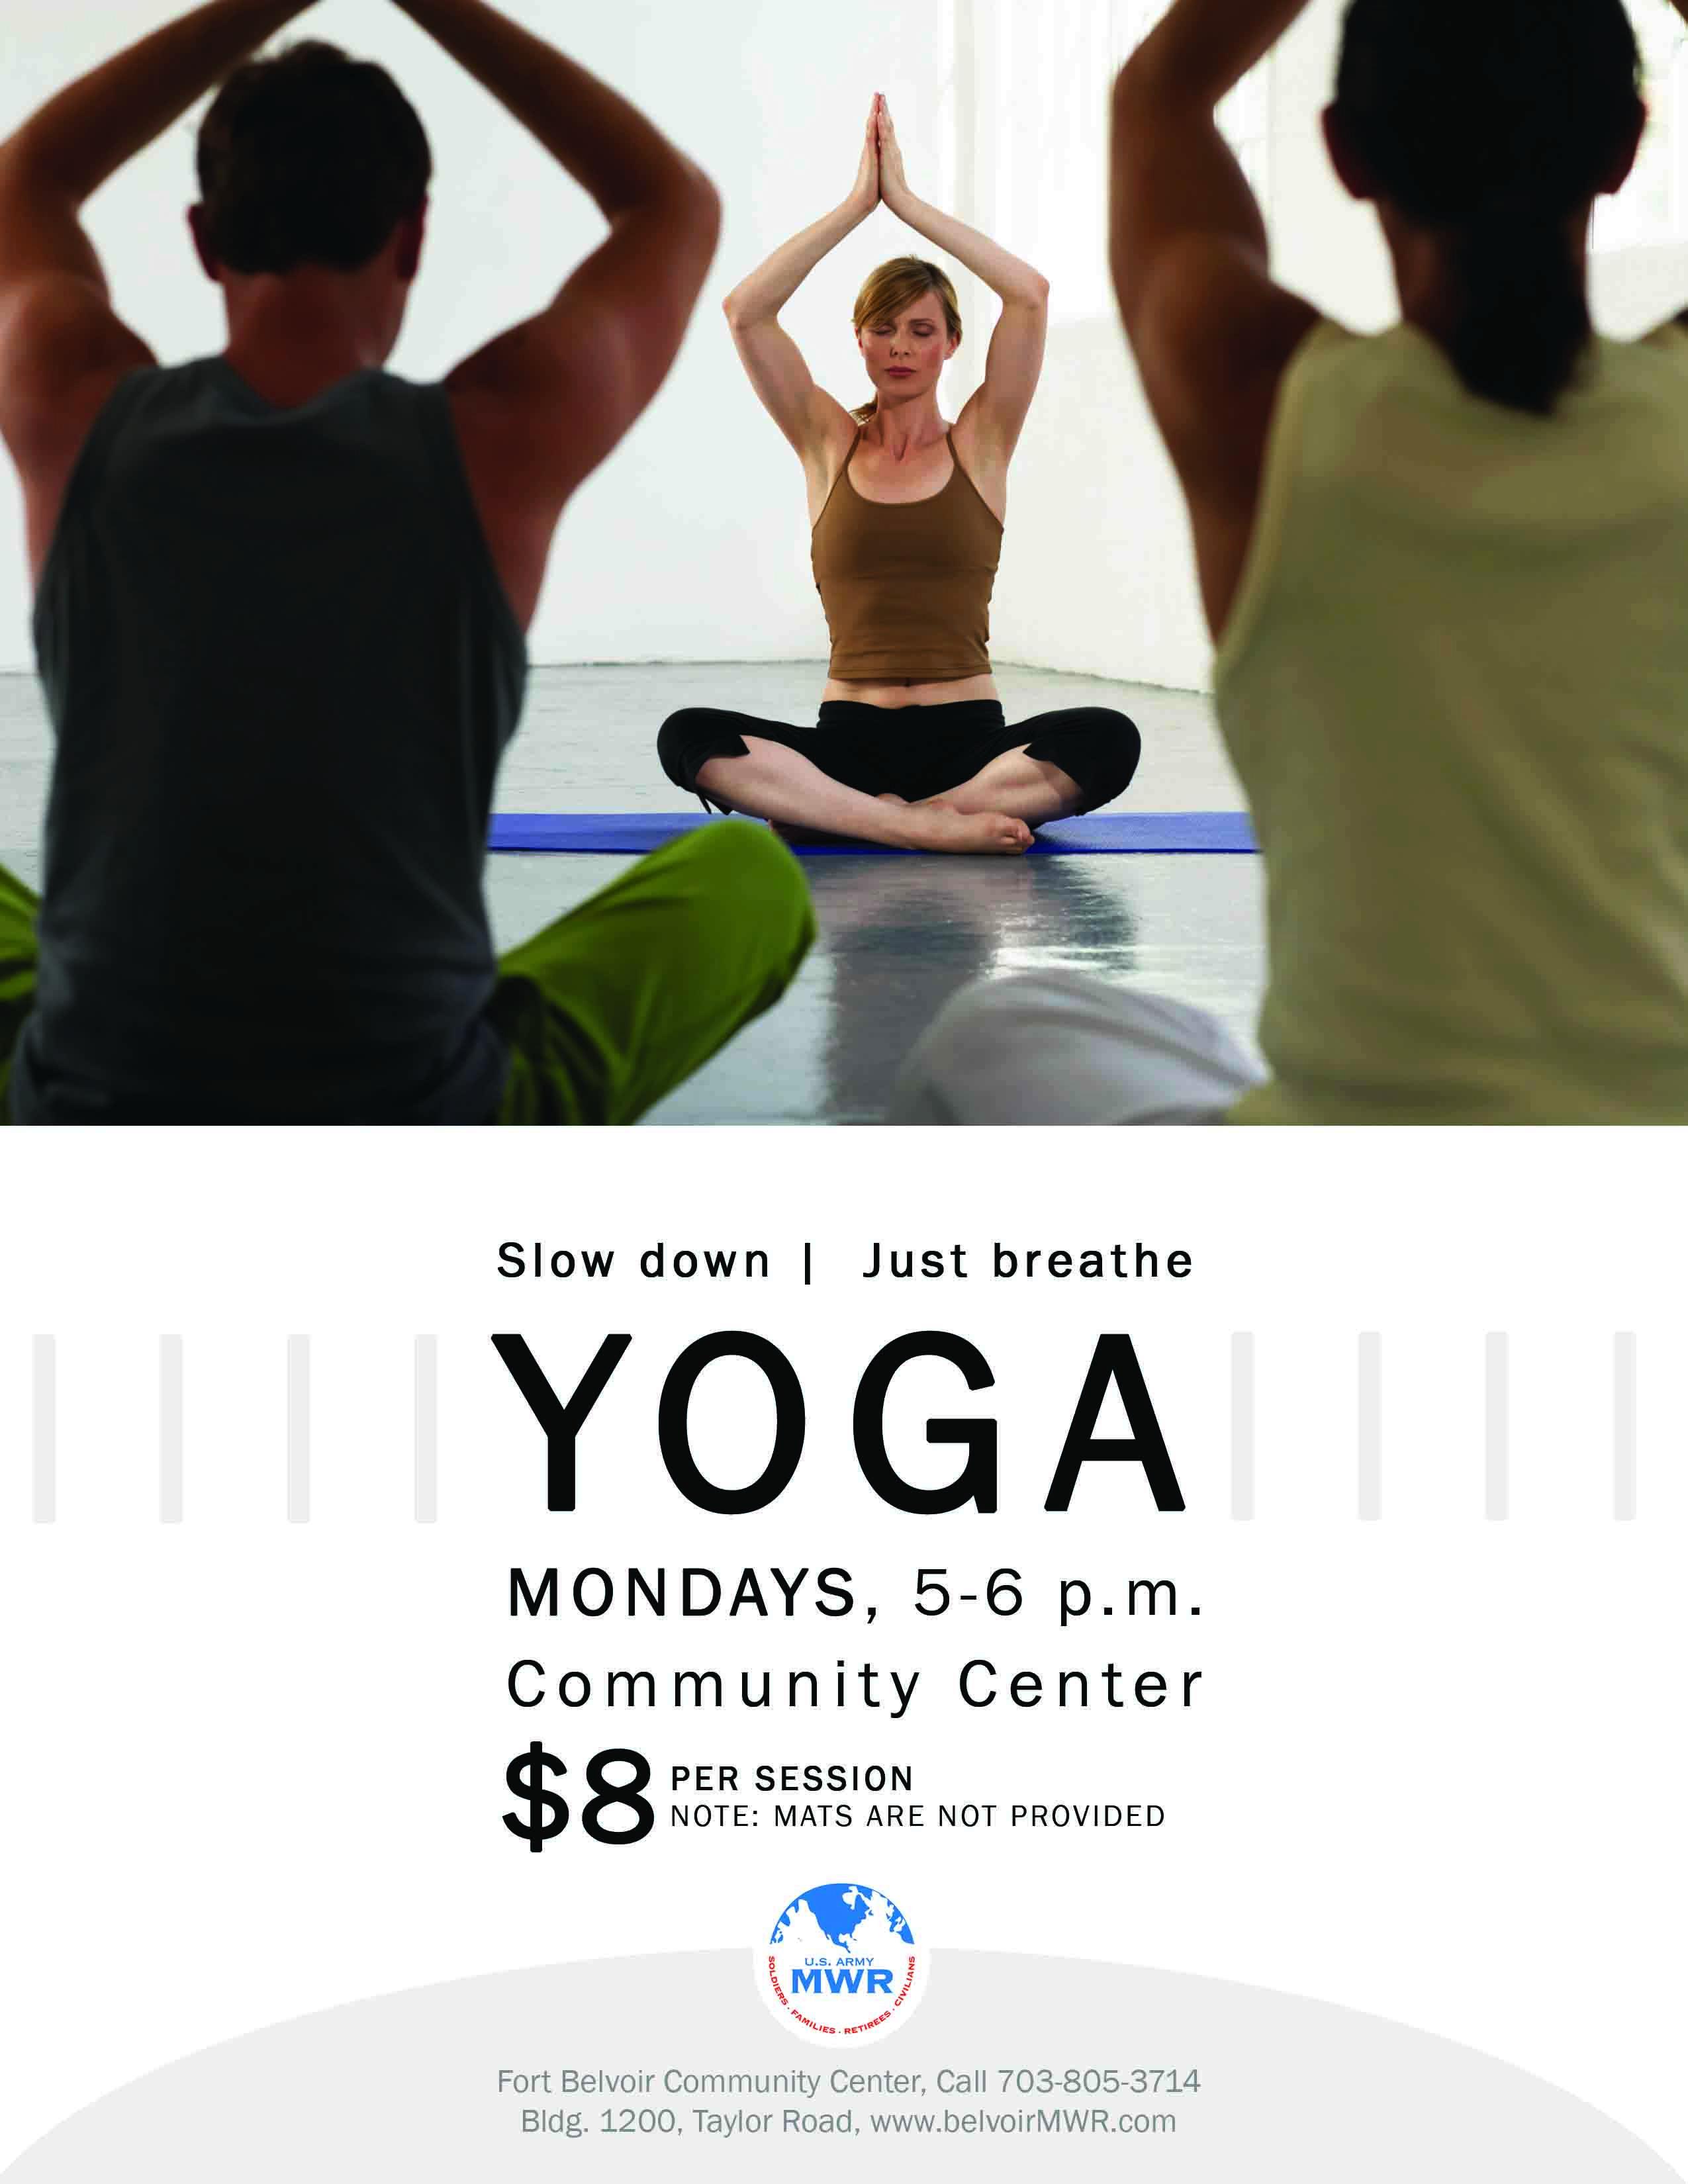 yoga flyer